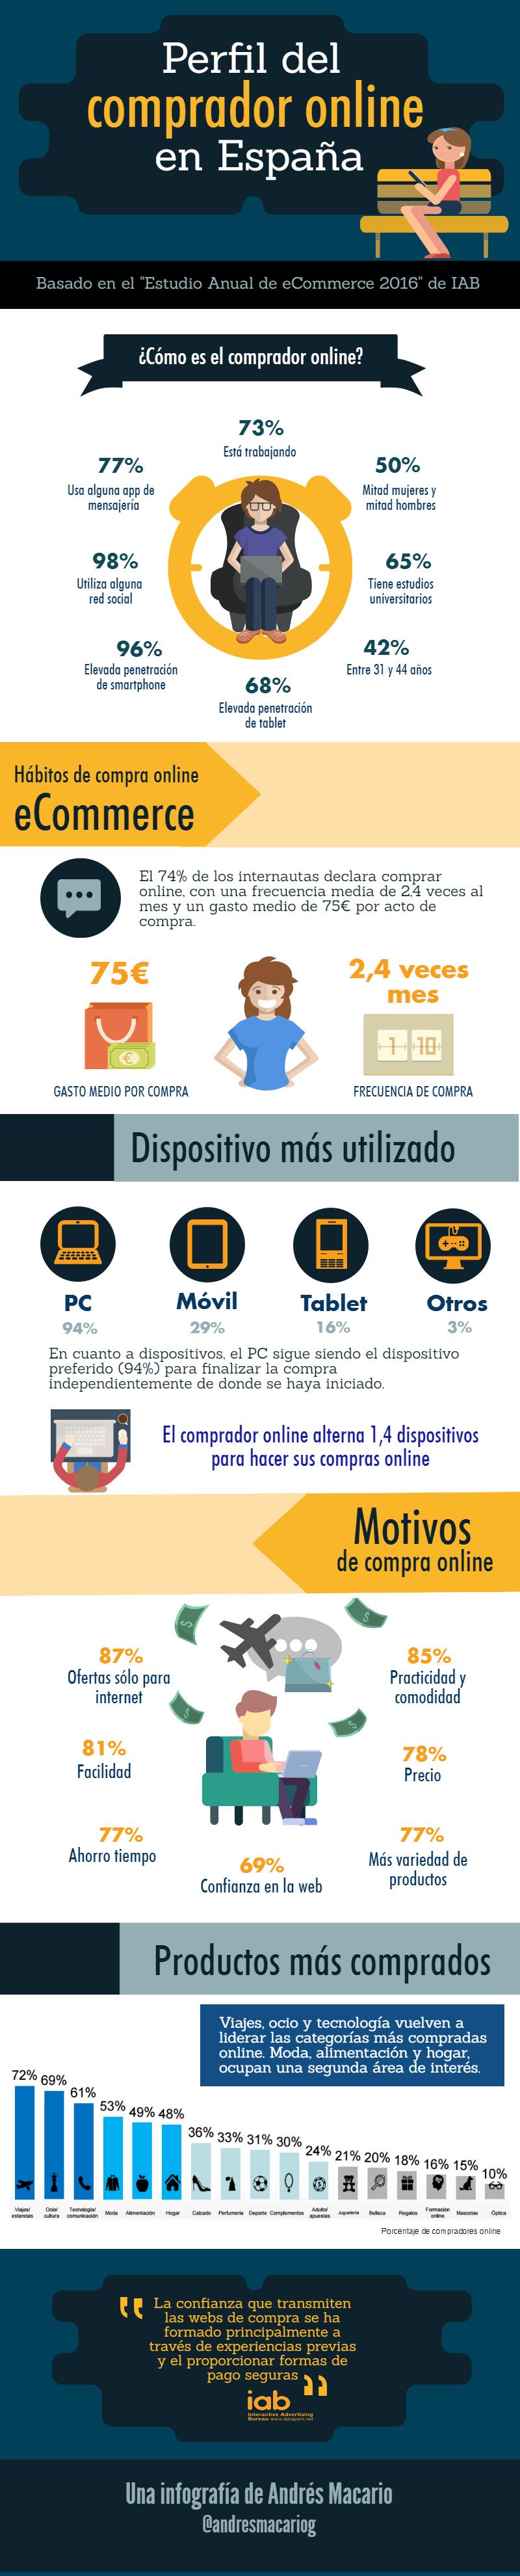 Perfil del comprador Online España Infografia en español